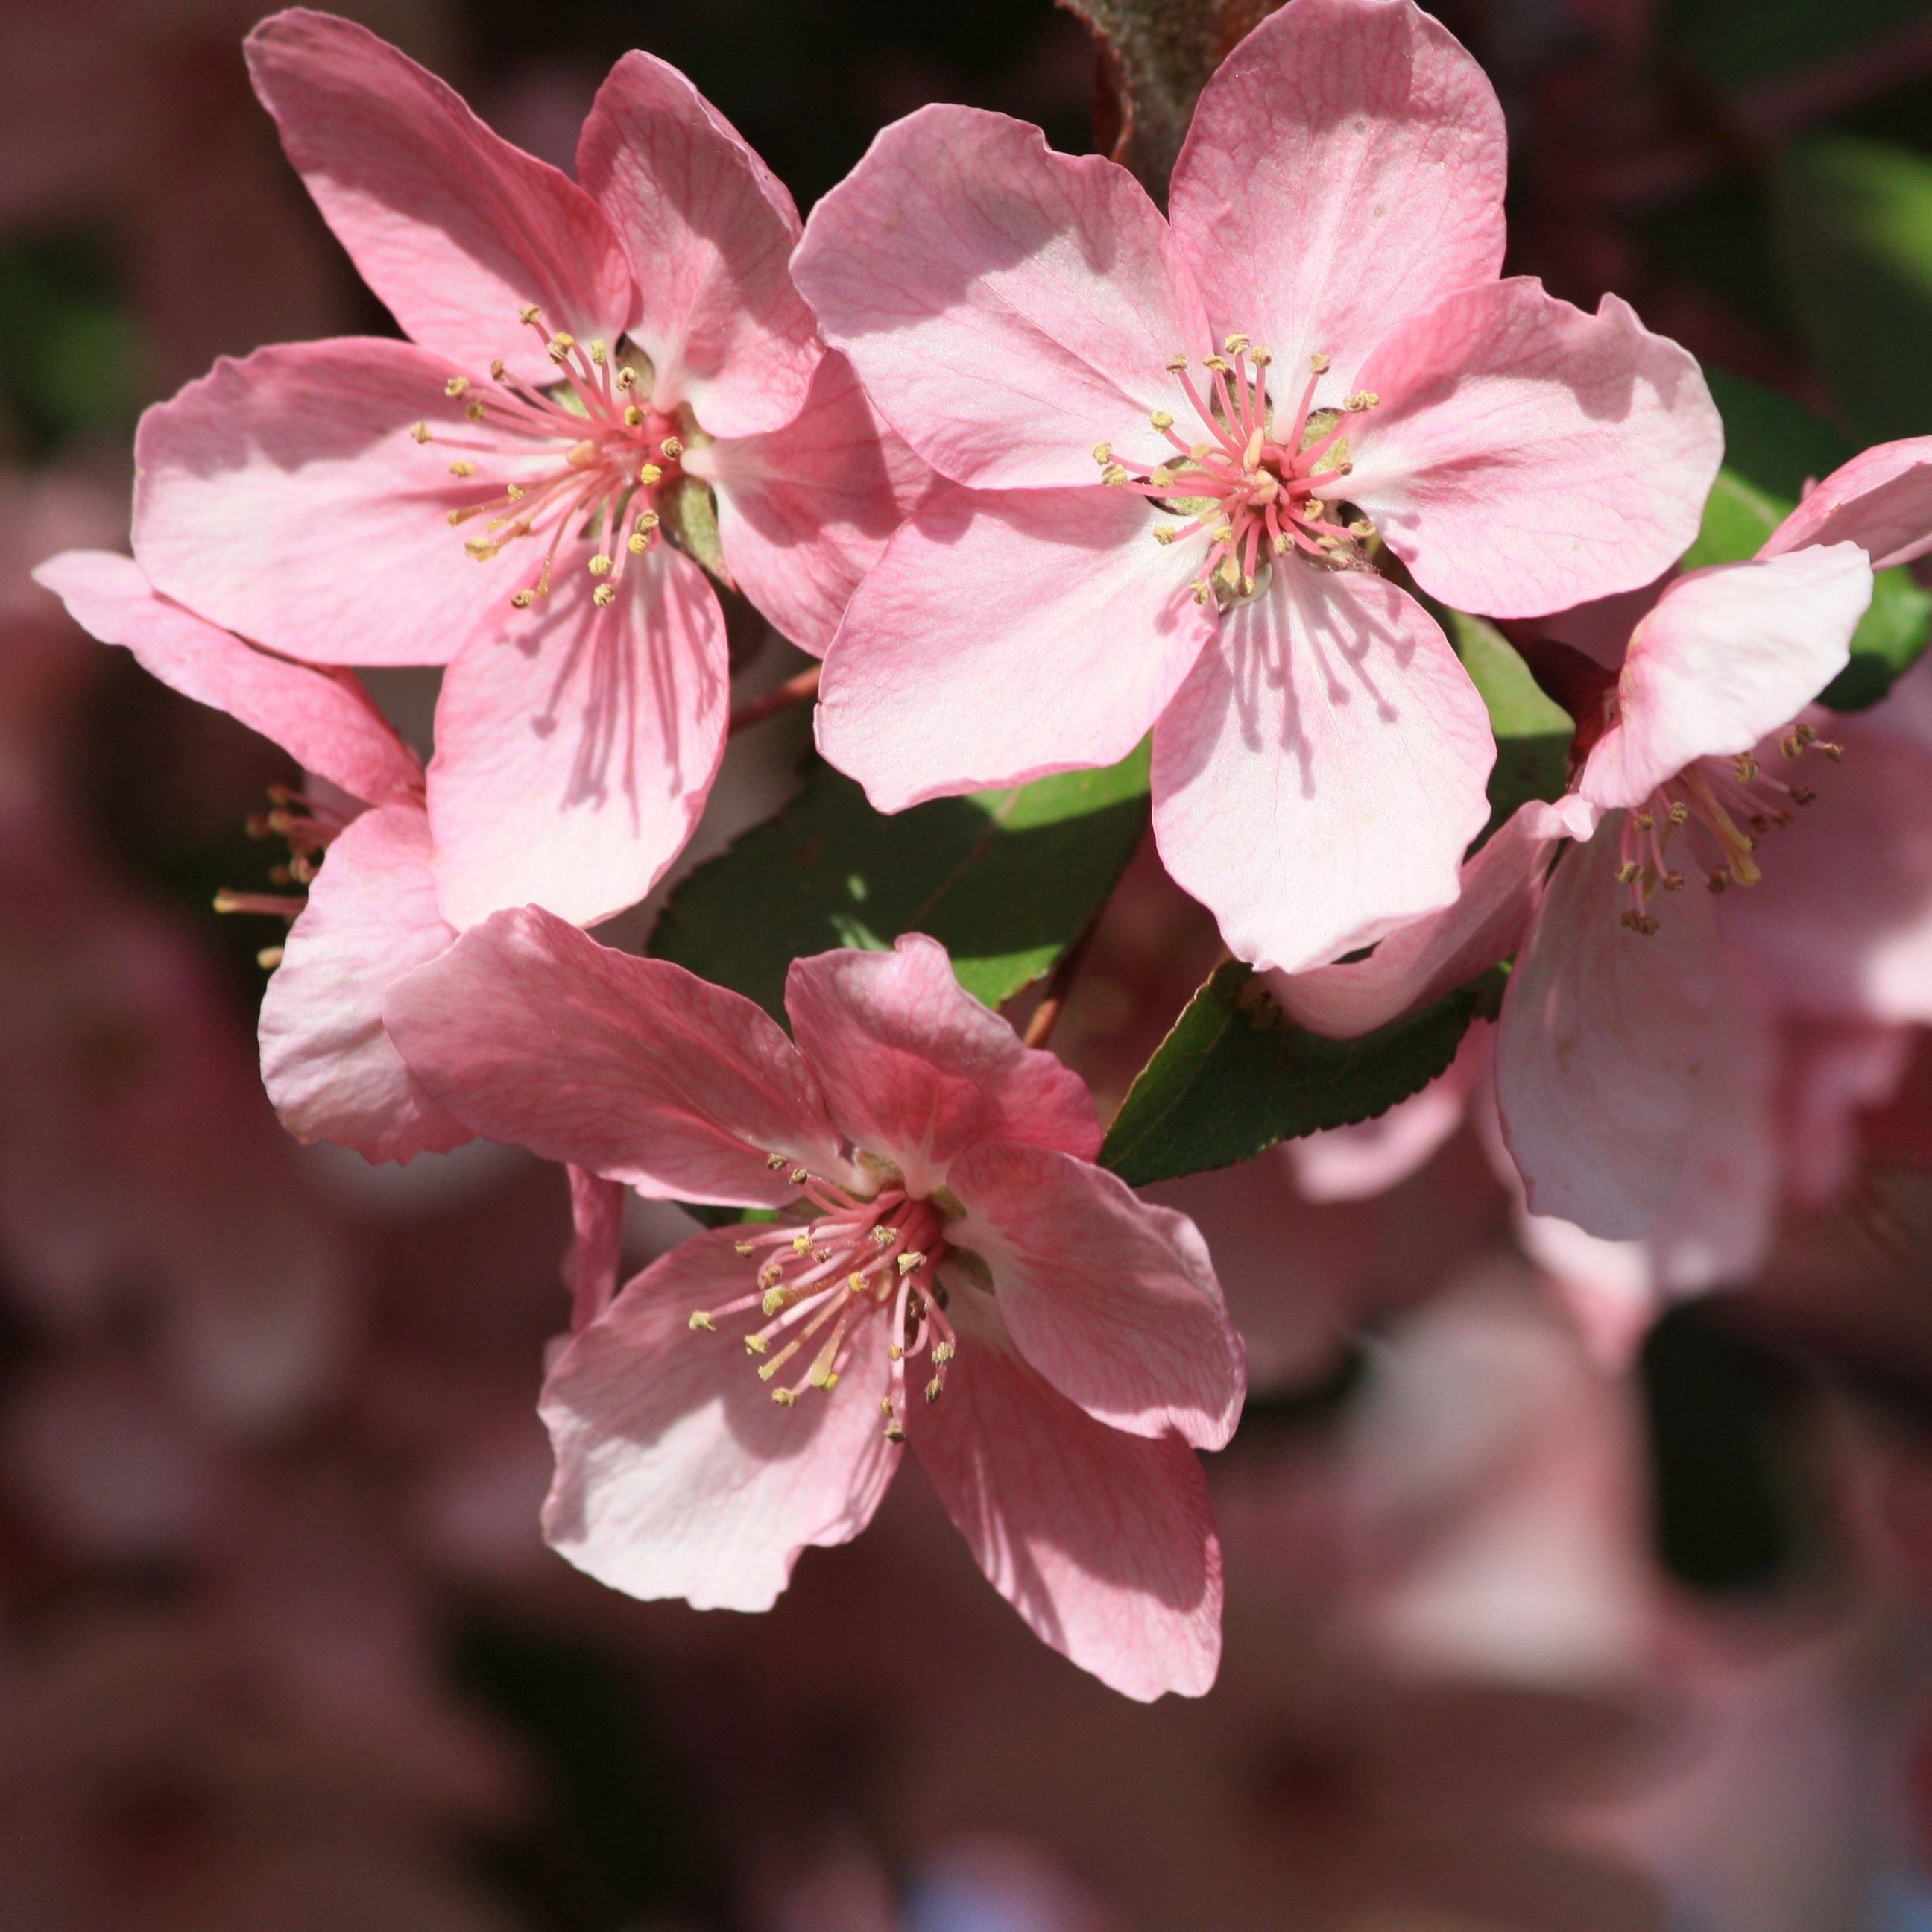 Landscape Tree Nature Blossom Plant Flower Petal Bloom Spring Macro Pink Cherry Close Up Background